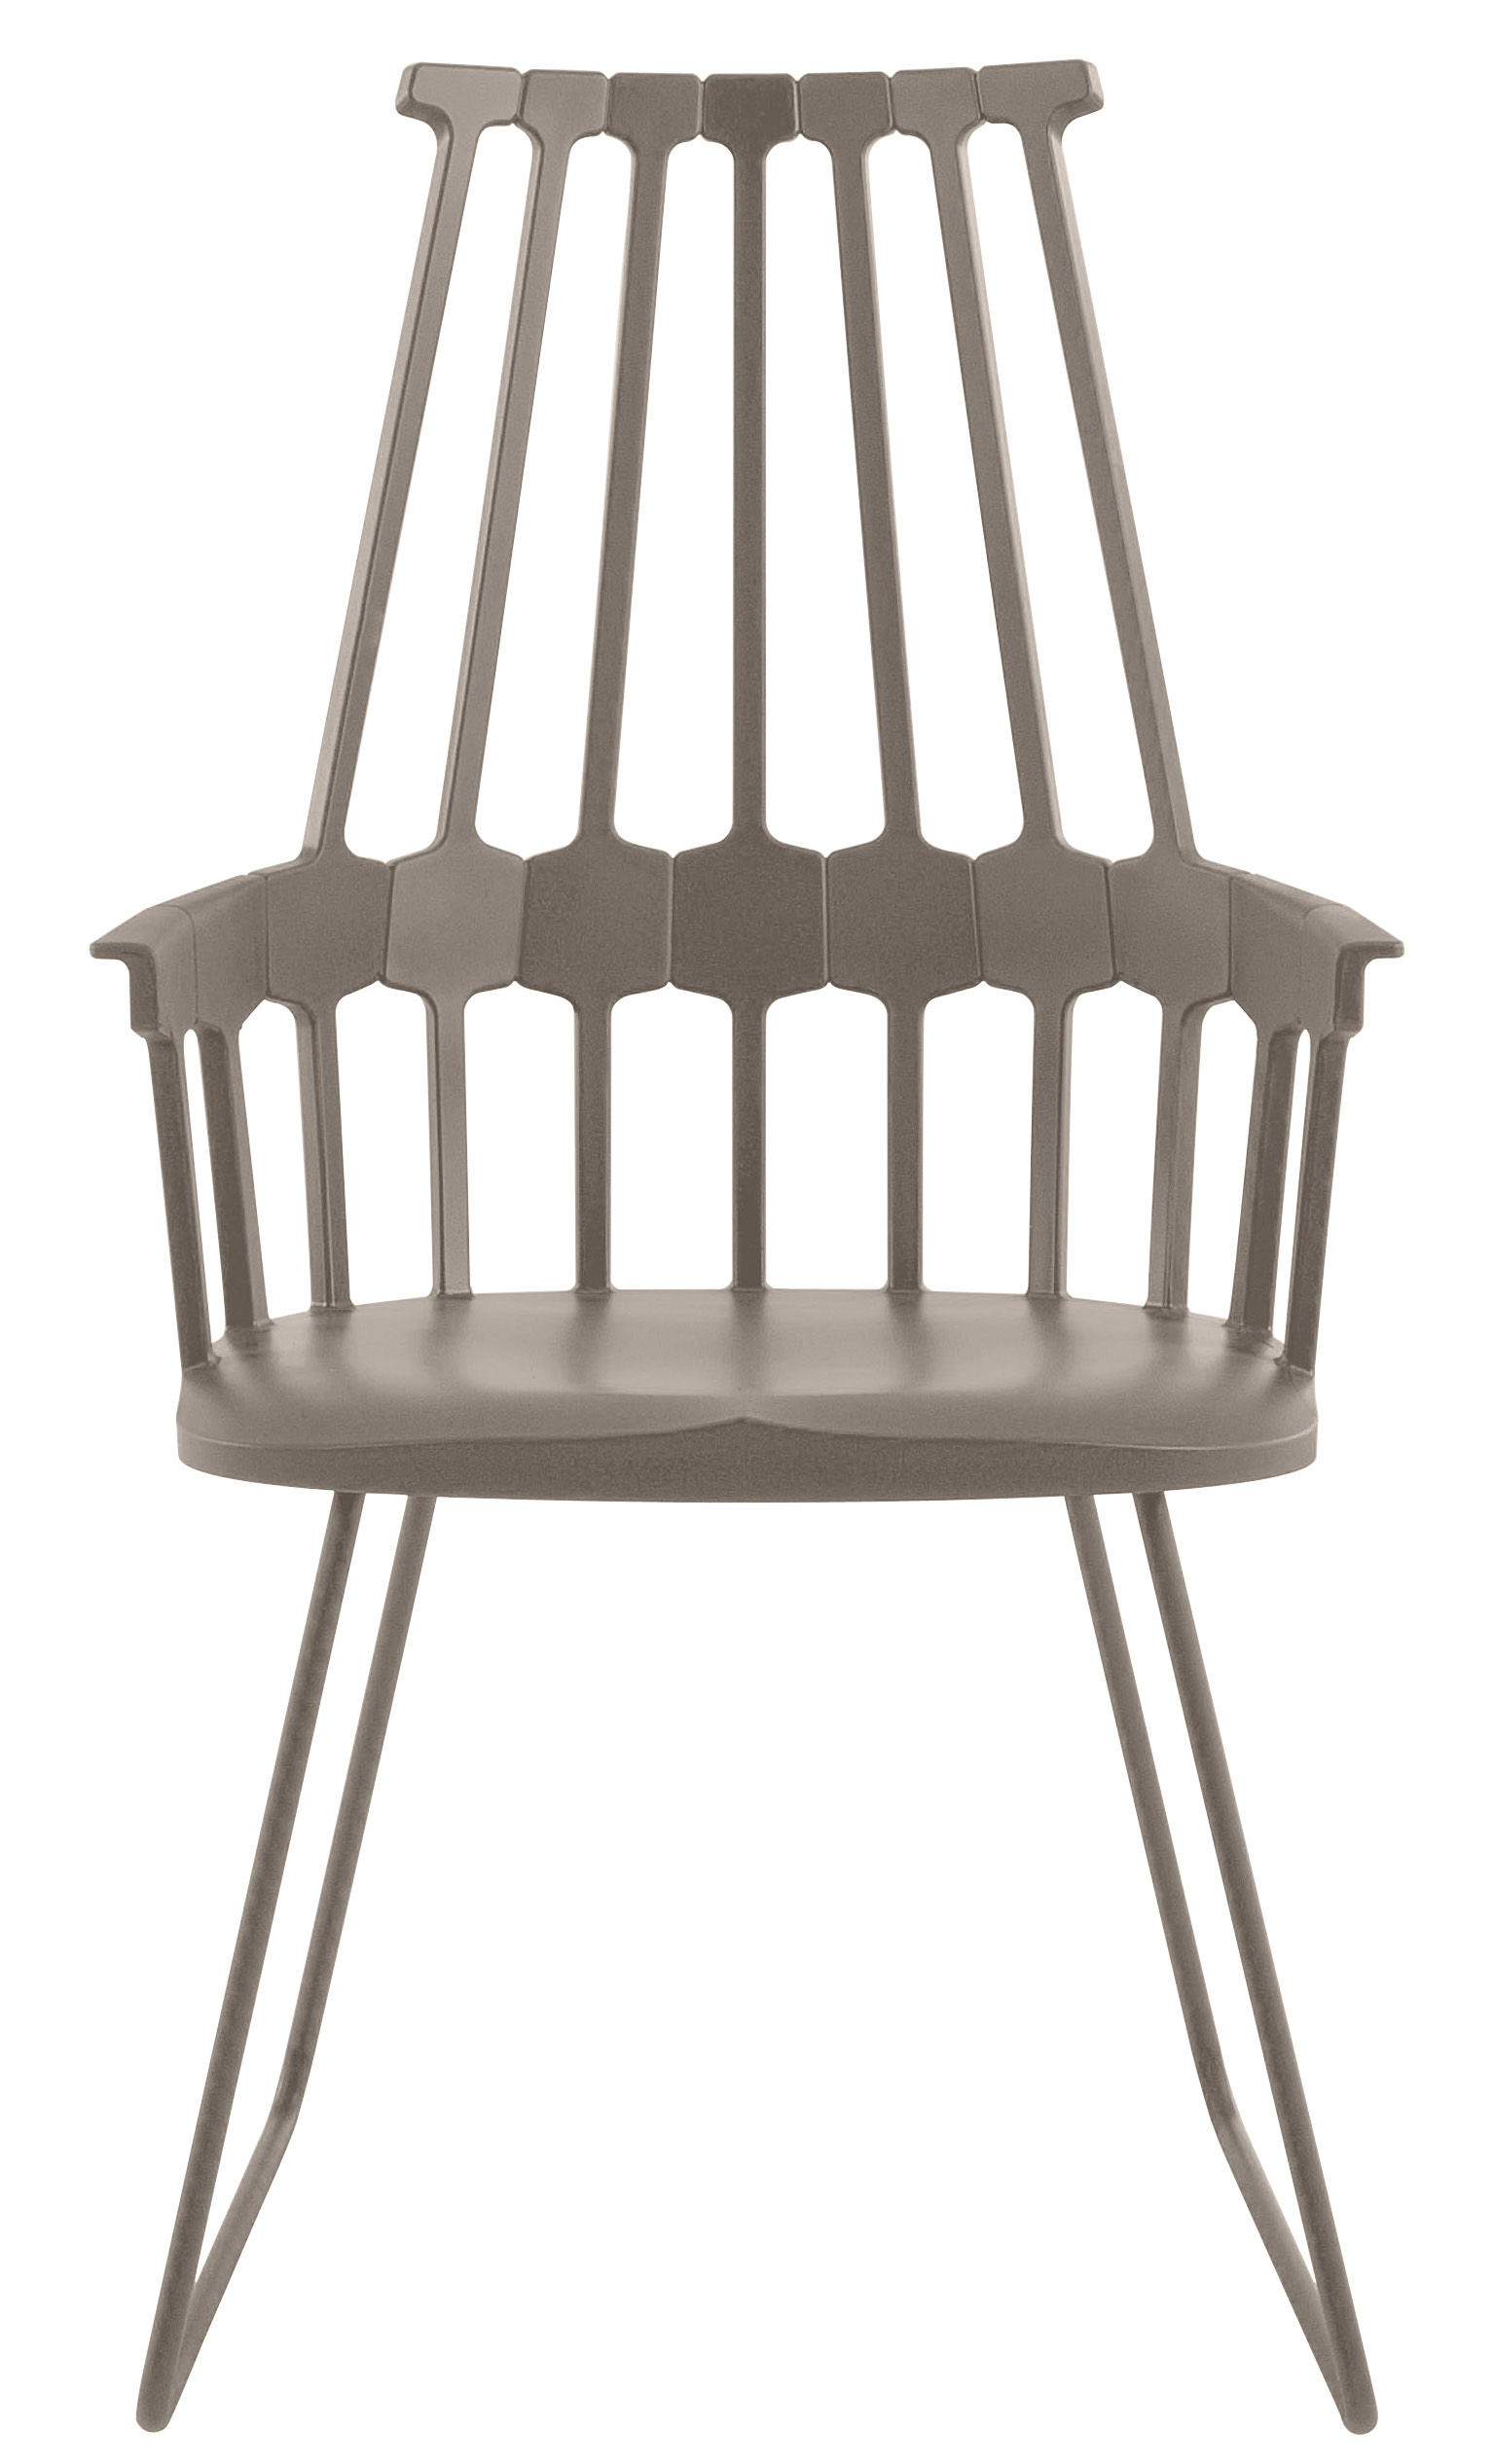 fauteuil comback polycarbonate pied luge m tal noisette kartell. Black Bedroom Furniture Sets. Home Design Ideas